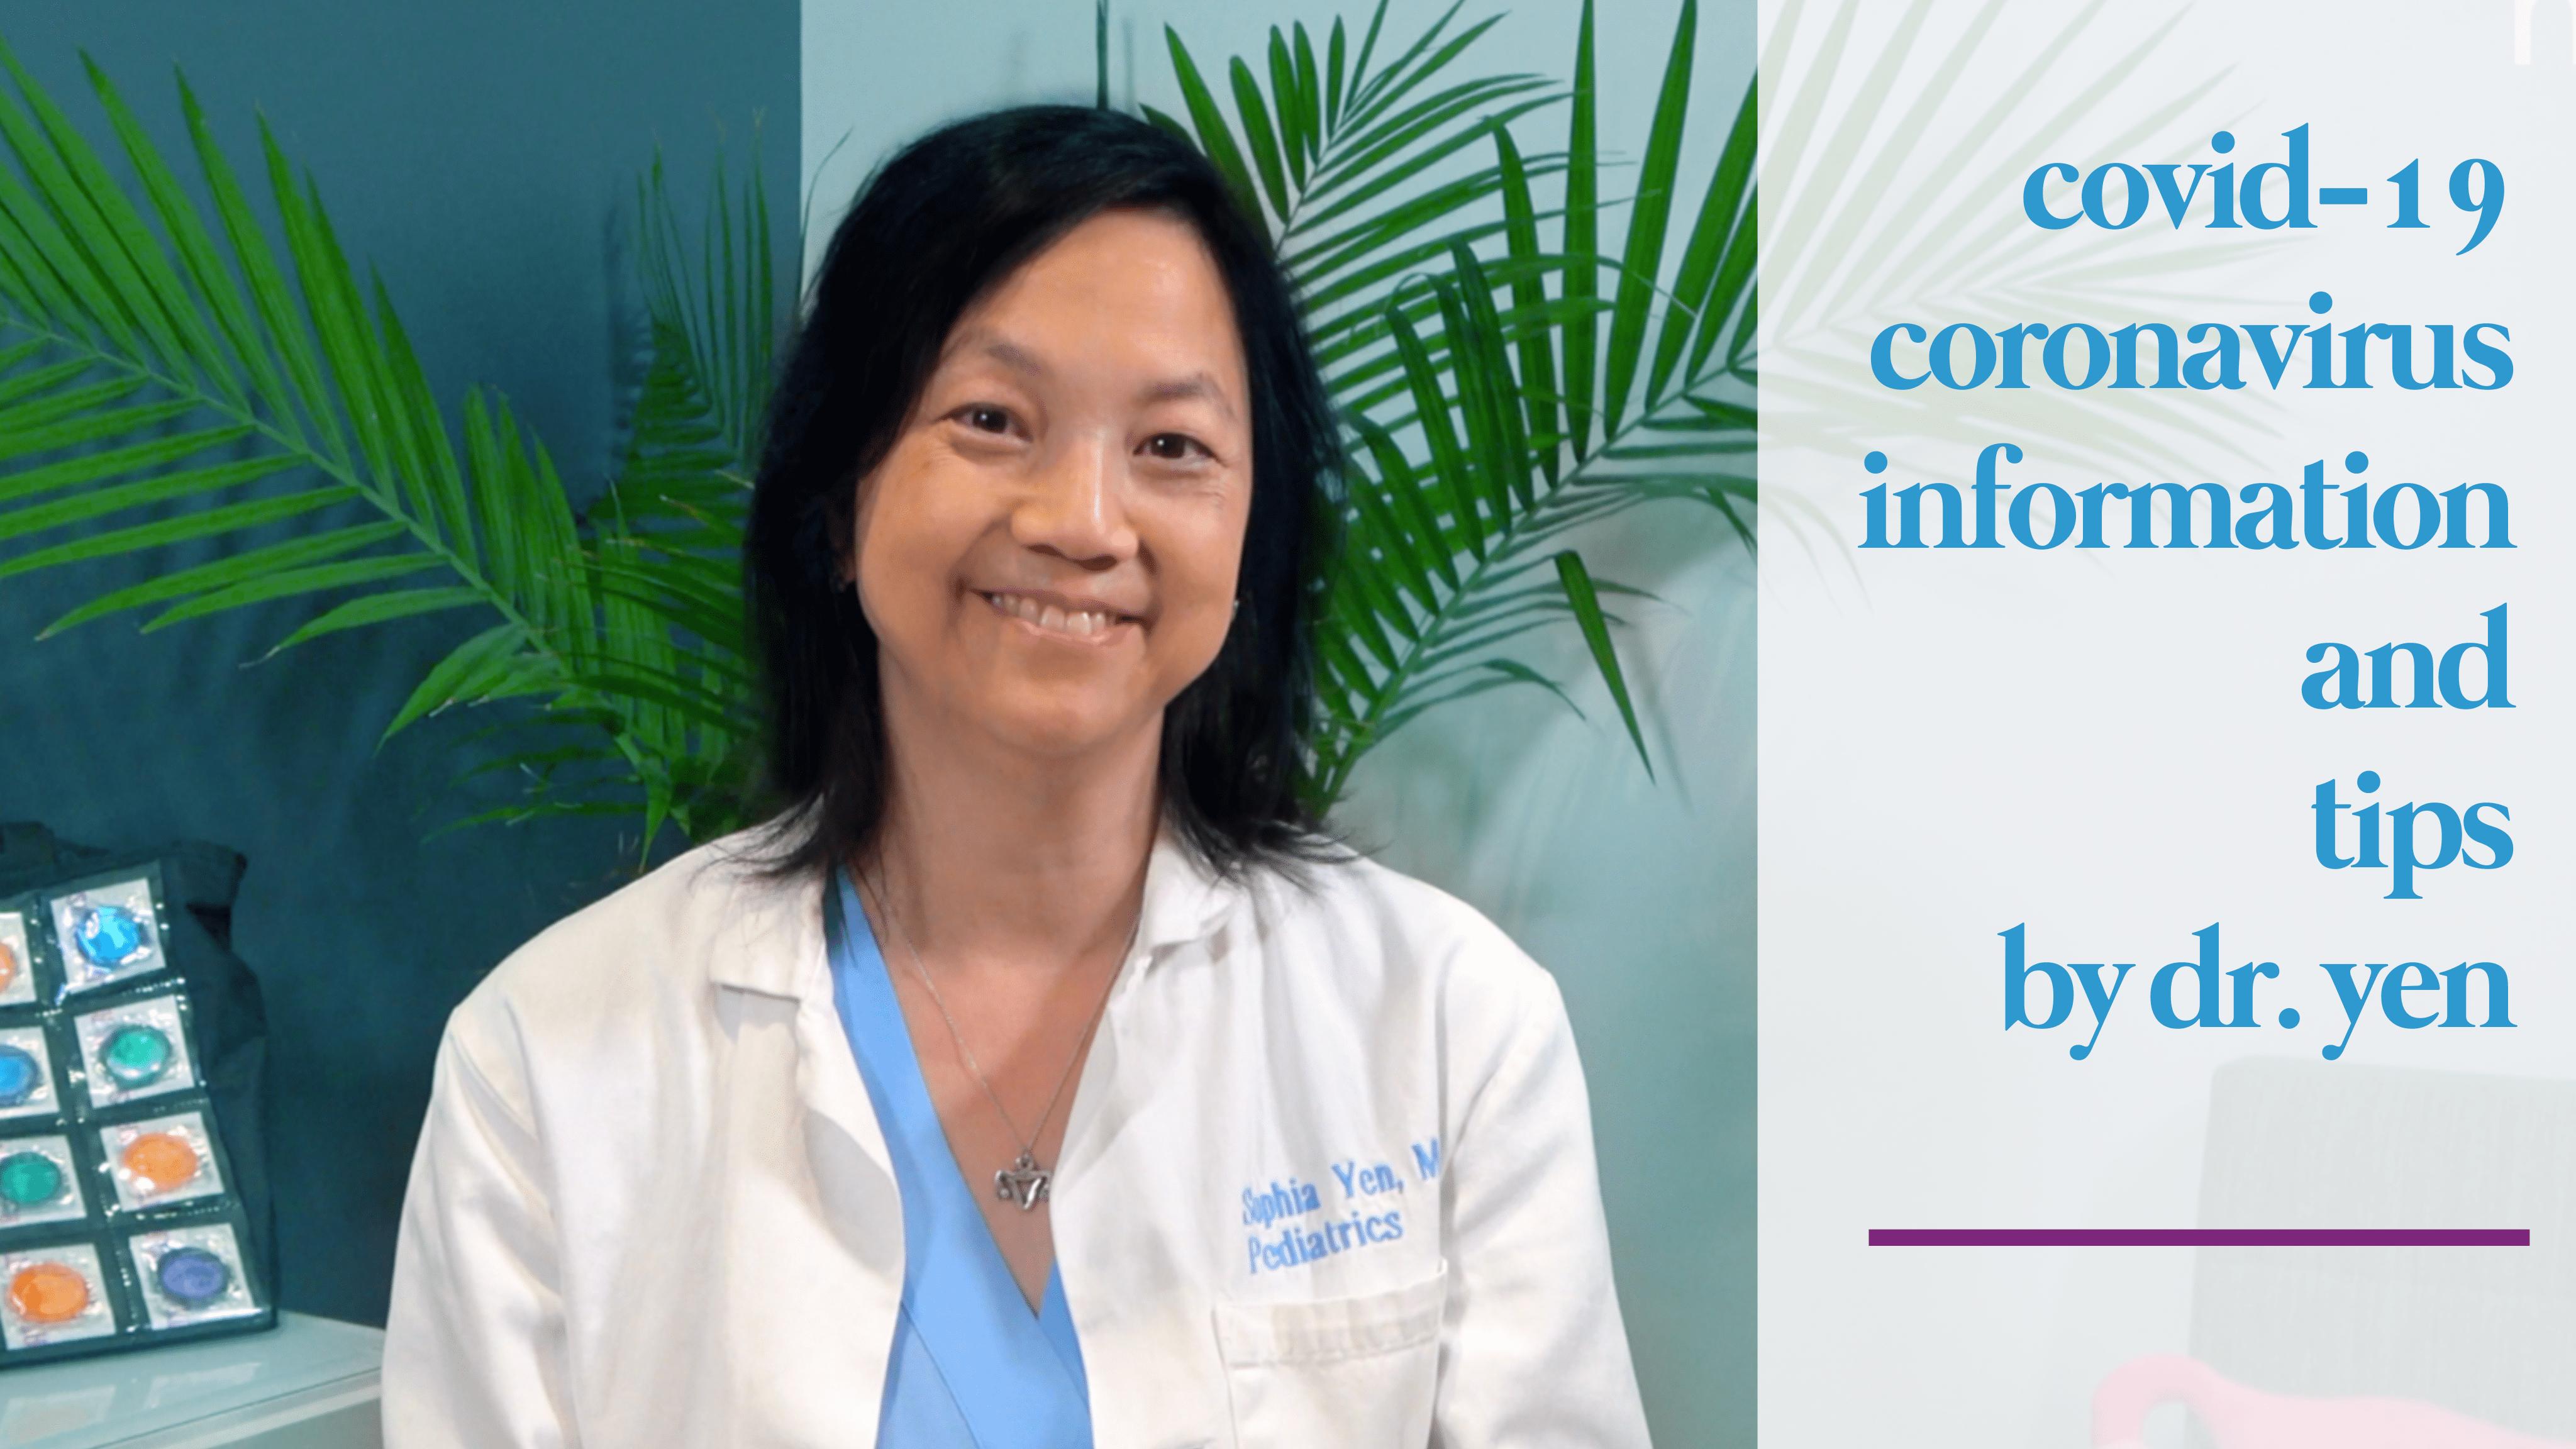 Doctor Sophia Yen